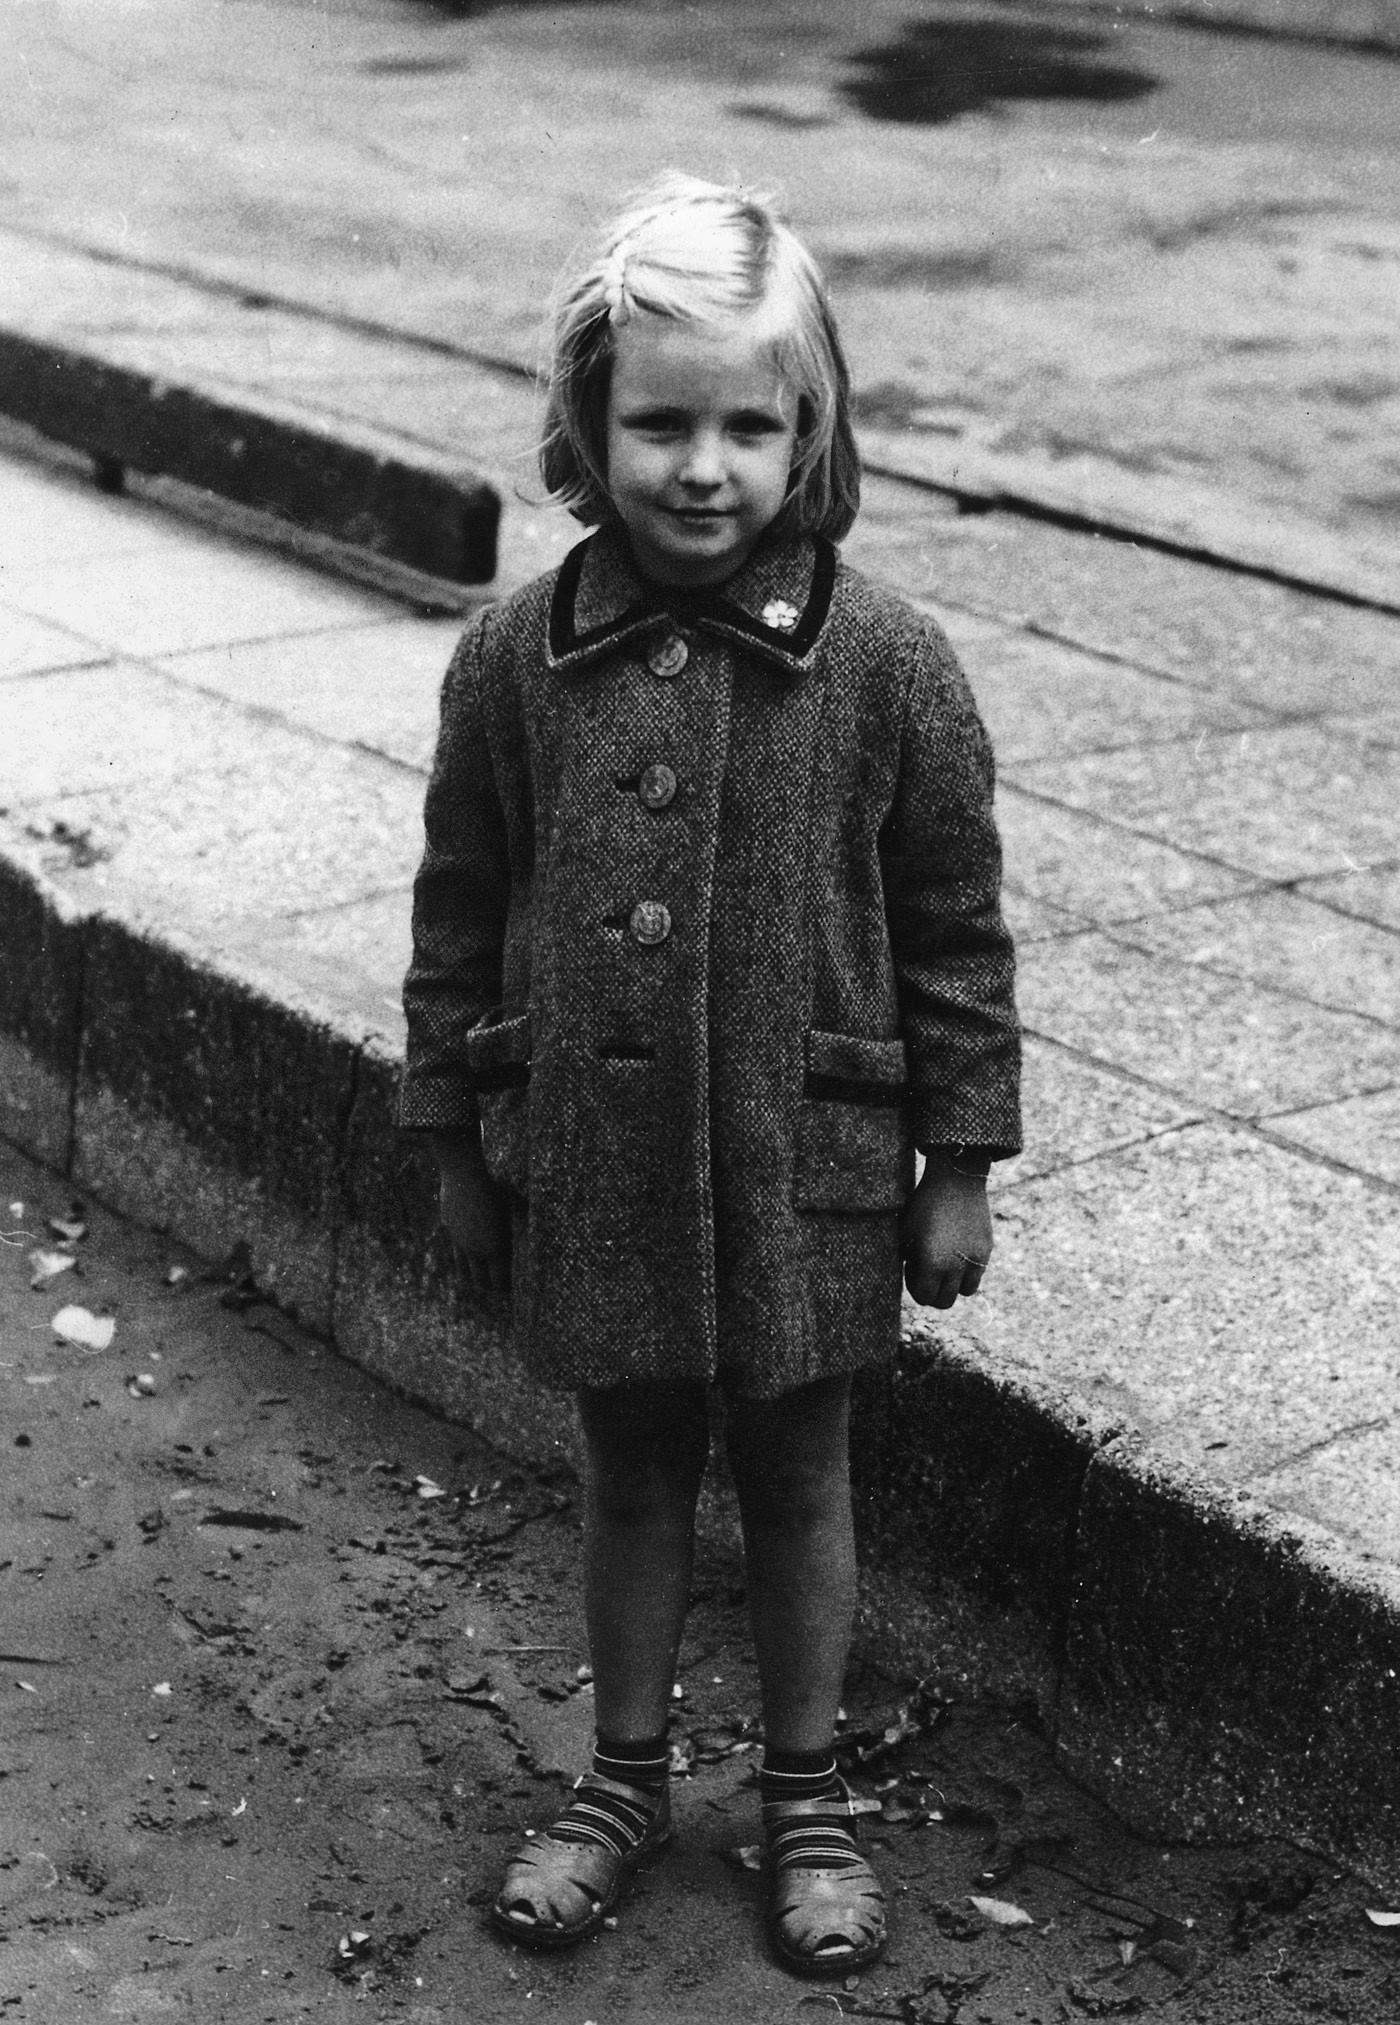 Pia Fris Laneth, Barndom, 1960, 1960'erne, 60'erne, de glade 60'ere, Min barndom, kendte danskere om deres barndom, Jes Stein Pedersen, Camilla Plum, Jesper Theilgaard, Mogens Blom, Hanne Richardt Beck.